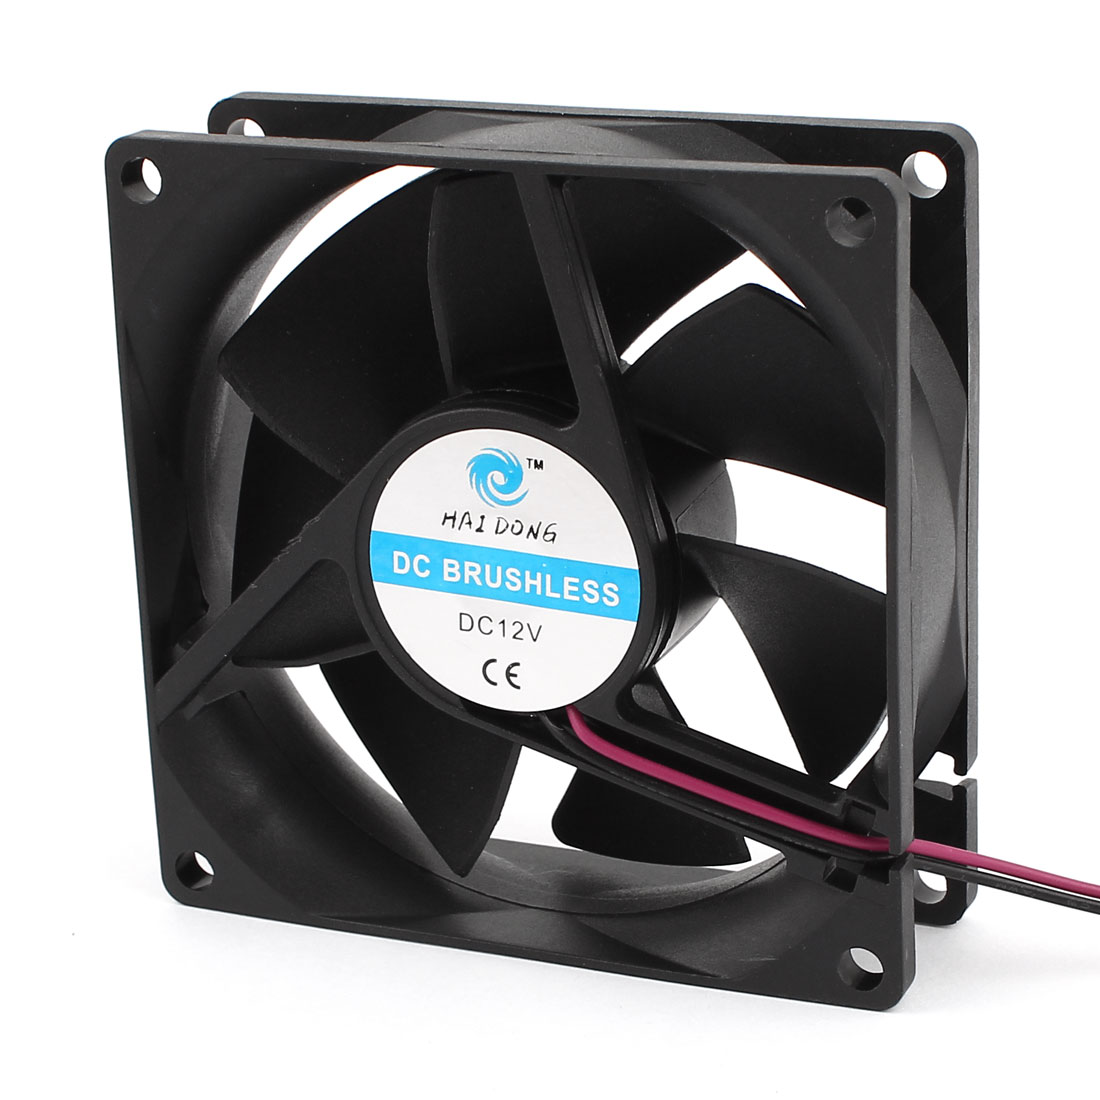 80mm x 25mm 8025 Brushless Cooling Fan DC 12V for Computer Case CPU Cooler